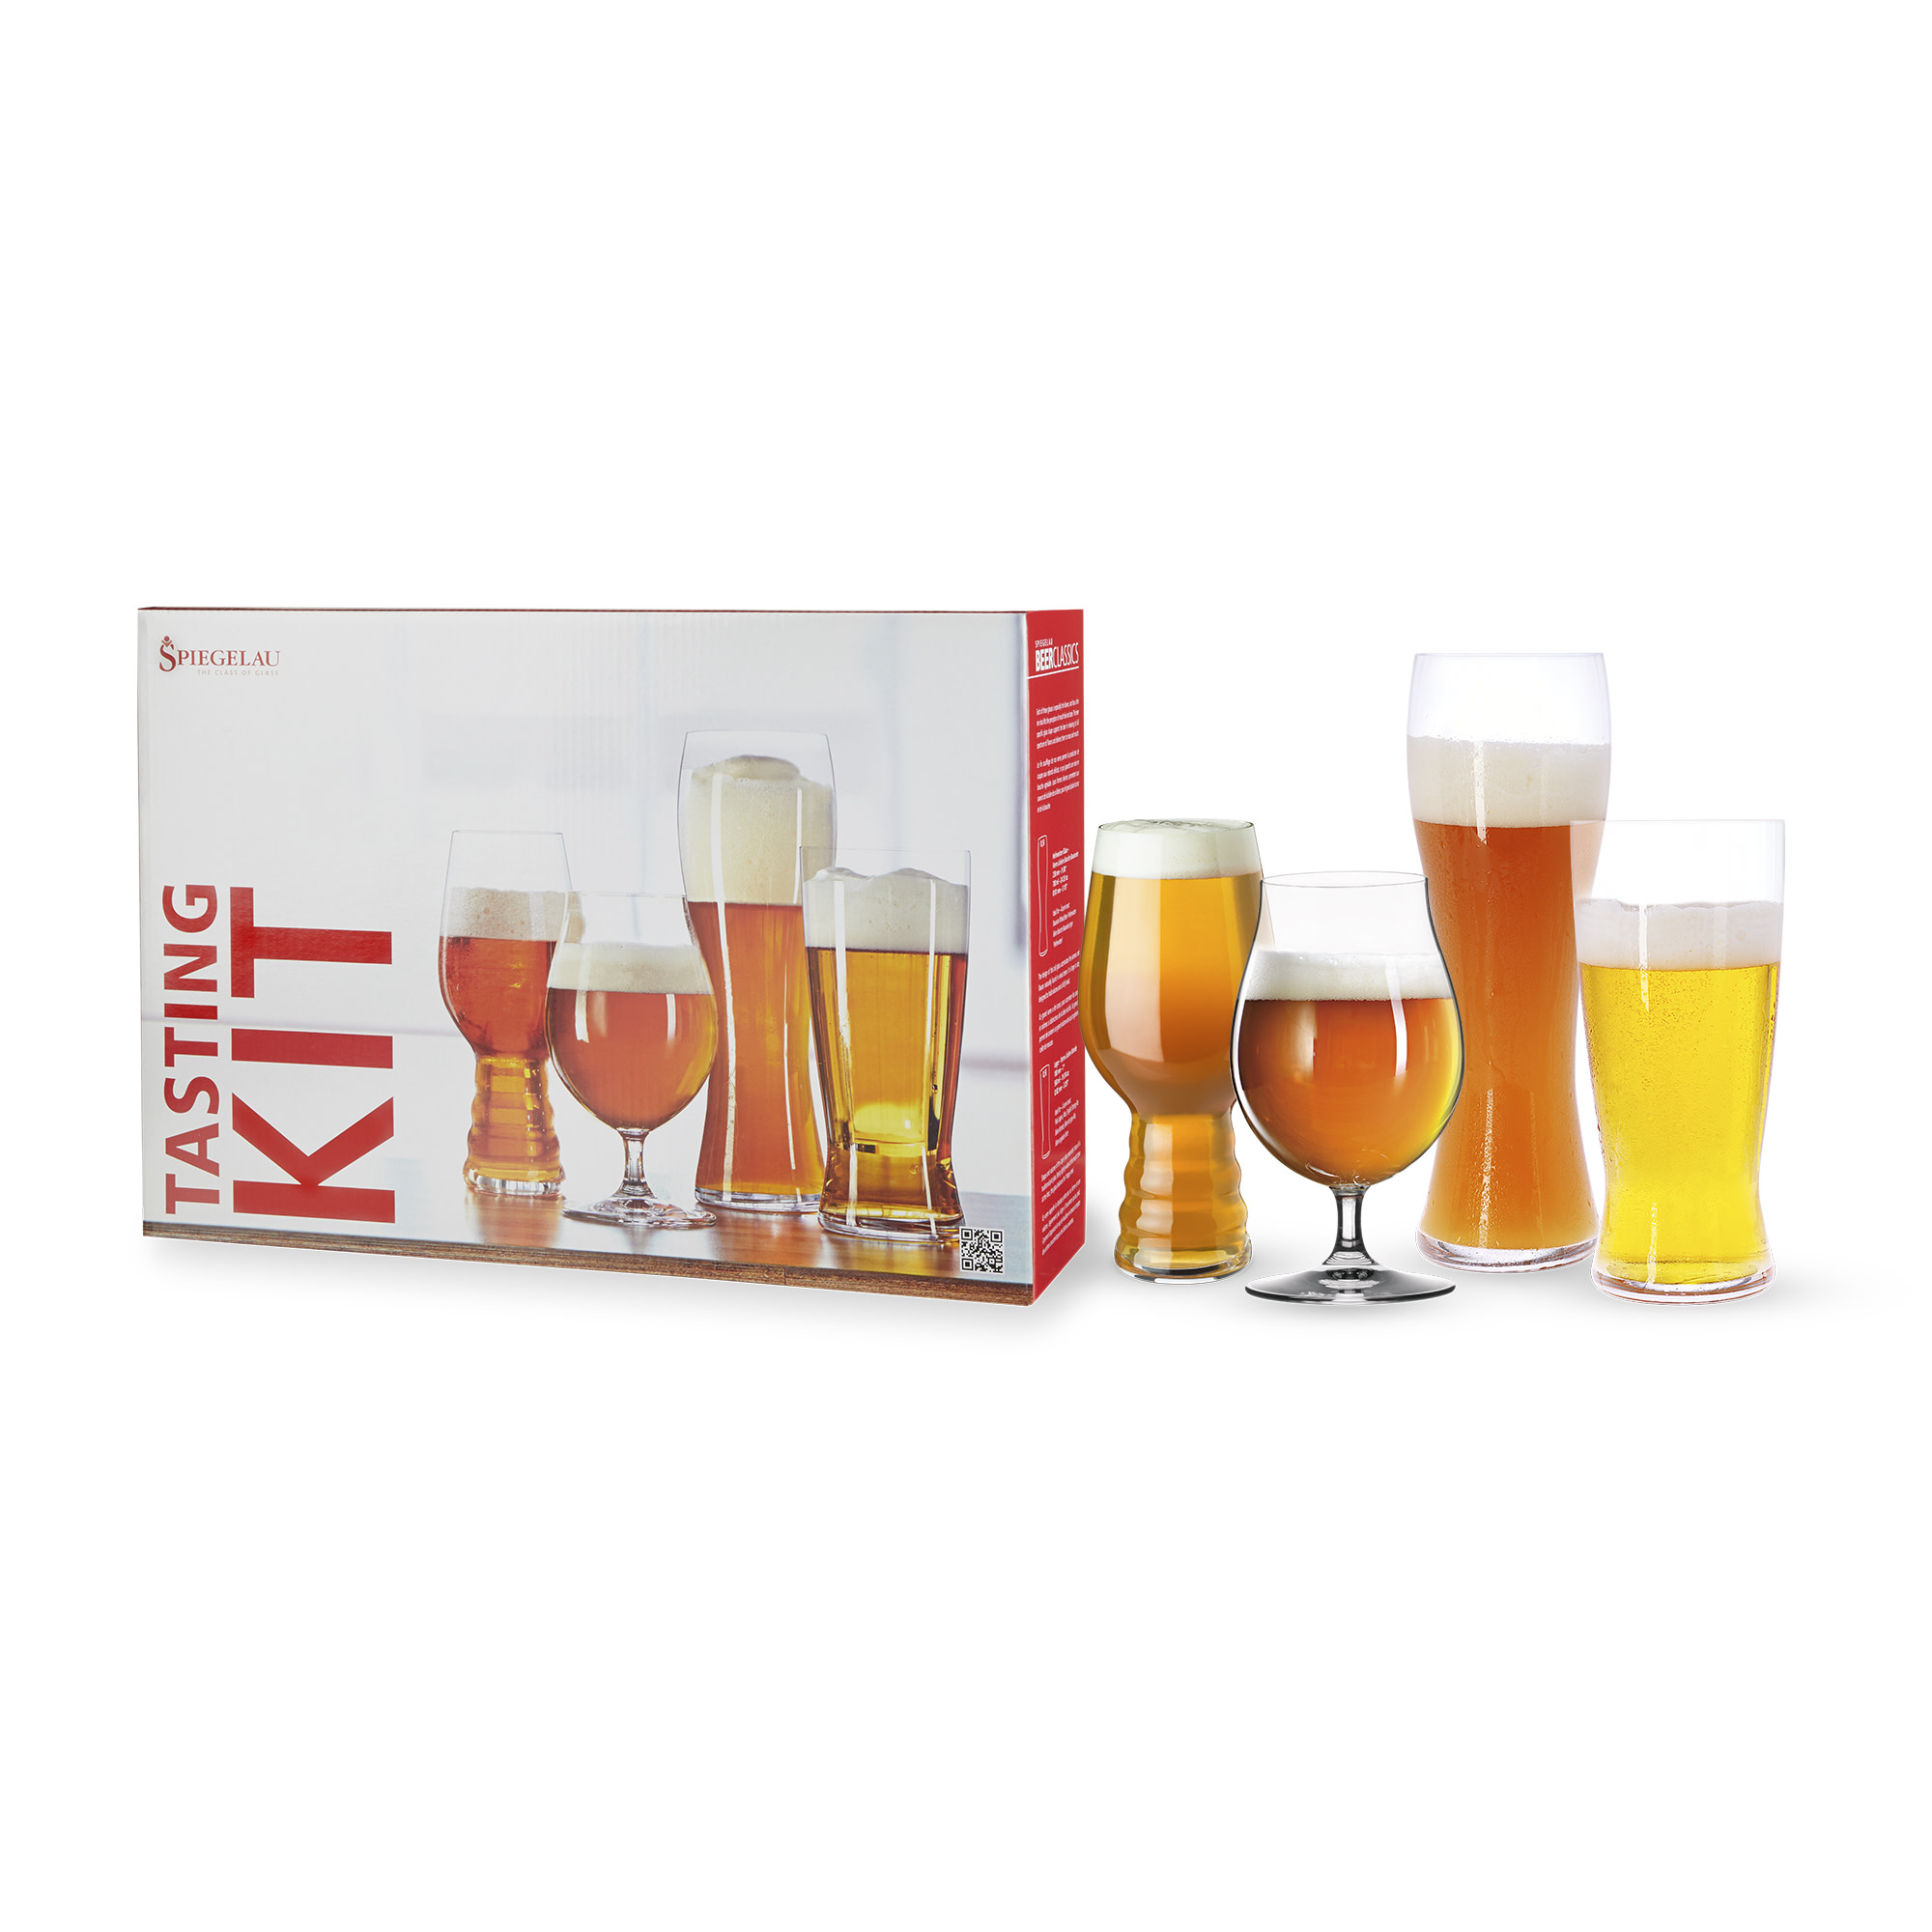 Spiegelau Classic Beer Glass Tasting Kit Set of 4